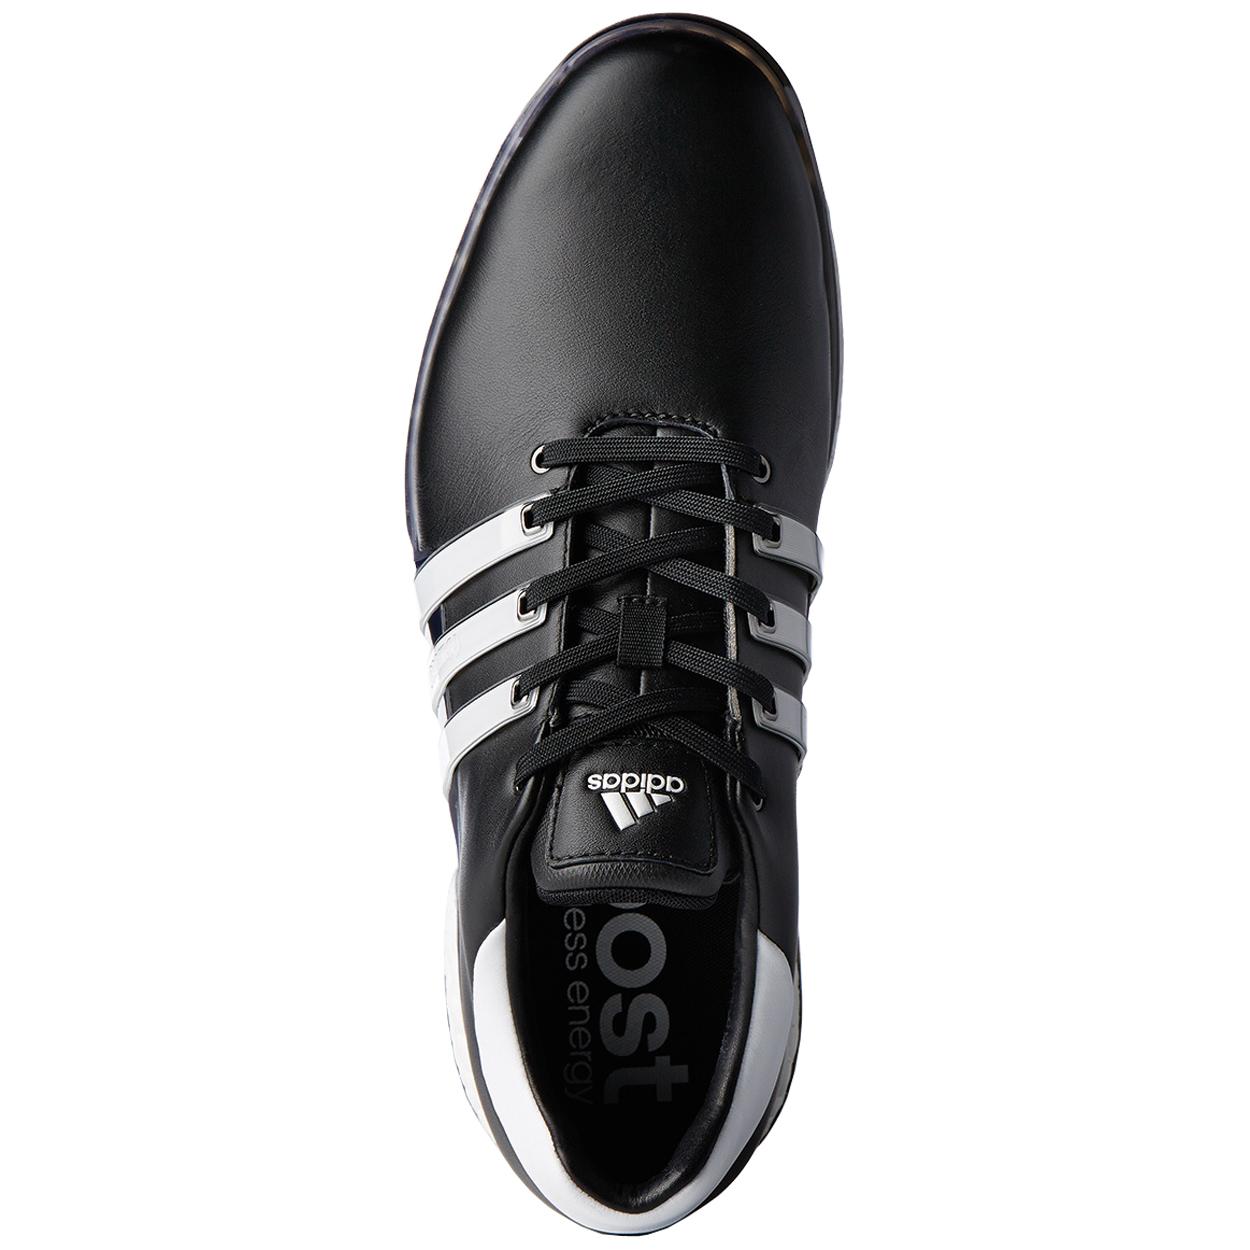 Adidas-Tour-360-2-0-Zapatos-De-Golf-De-Cuero-A-ESTRENAR miniatura 7